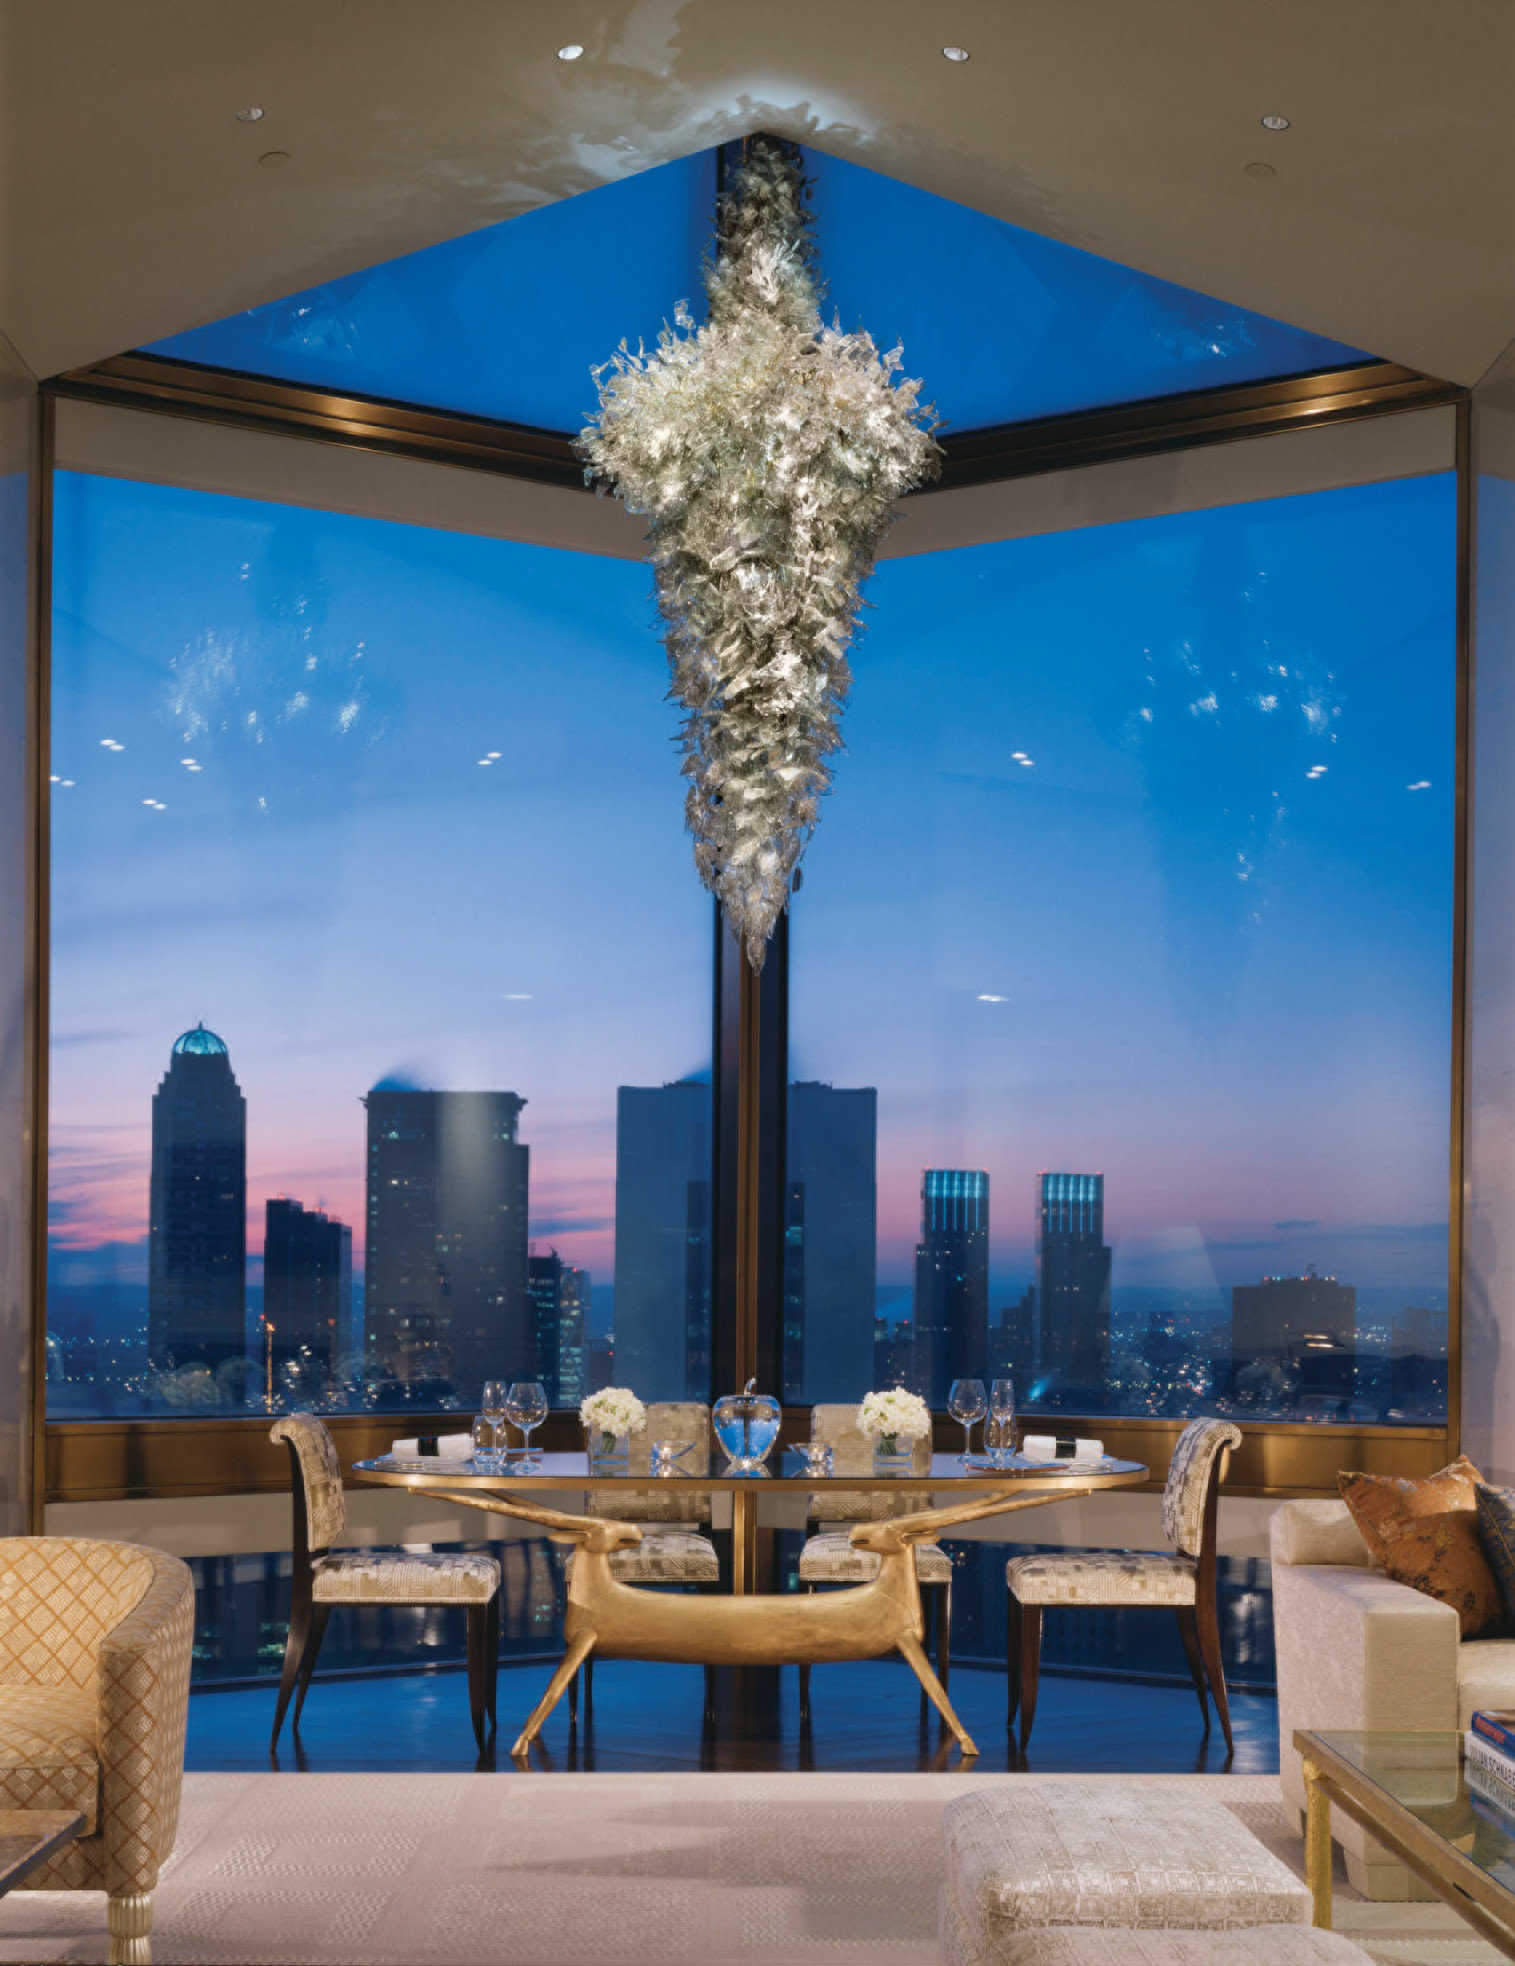 Hotels Luxury Travel ceiling wall interior design window Lobby wallpaper sky overlooking